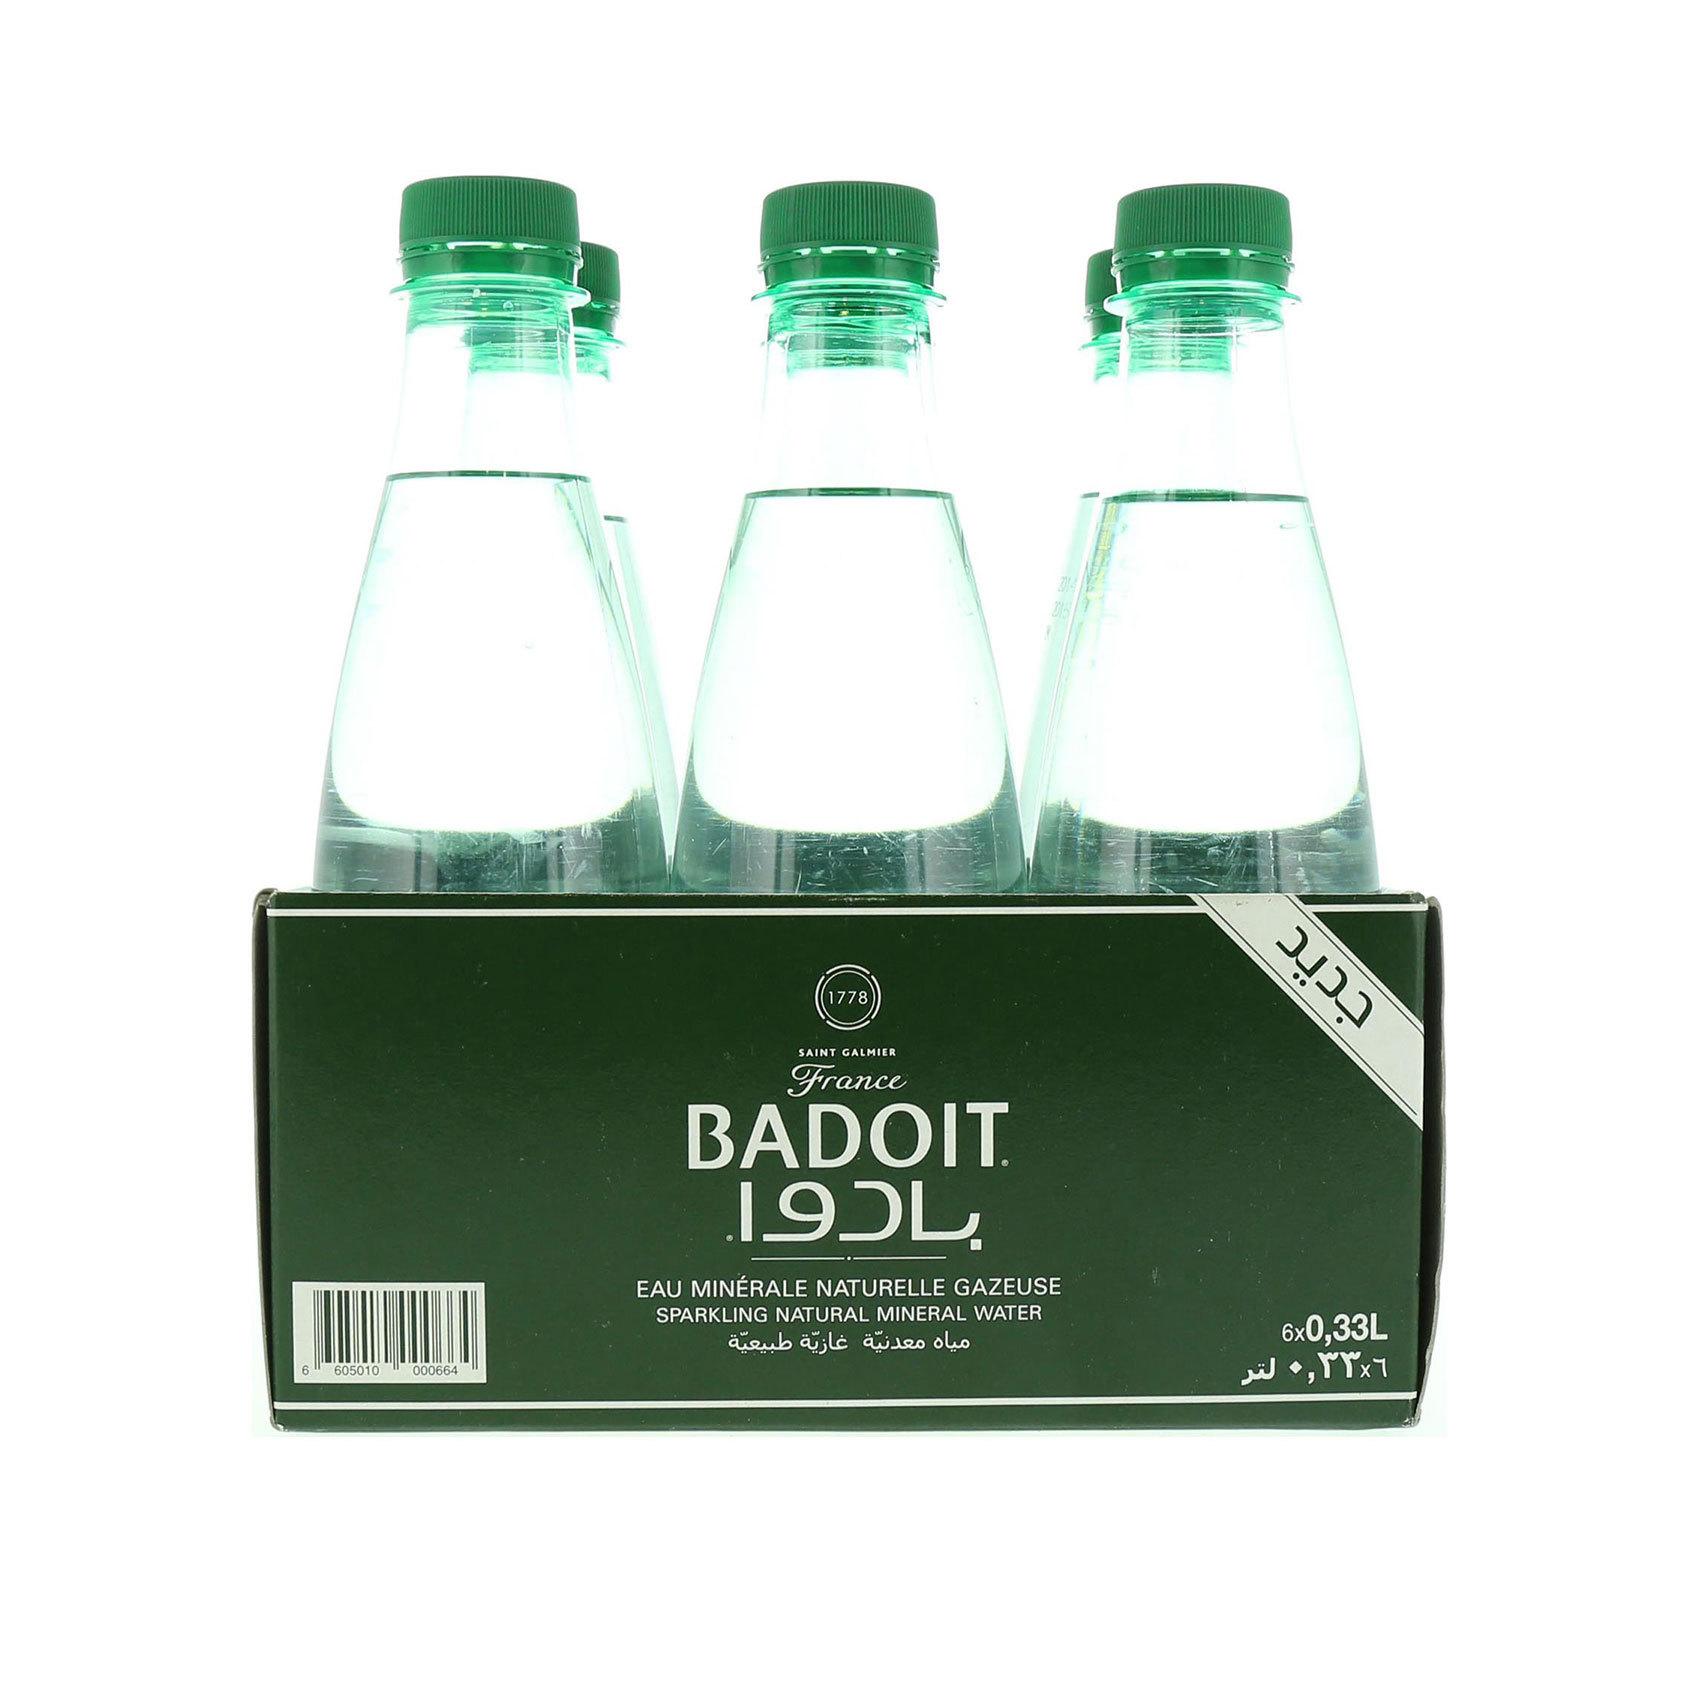 BADOIT SPARKLING WATER PET 330MLX6